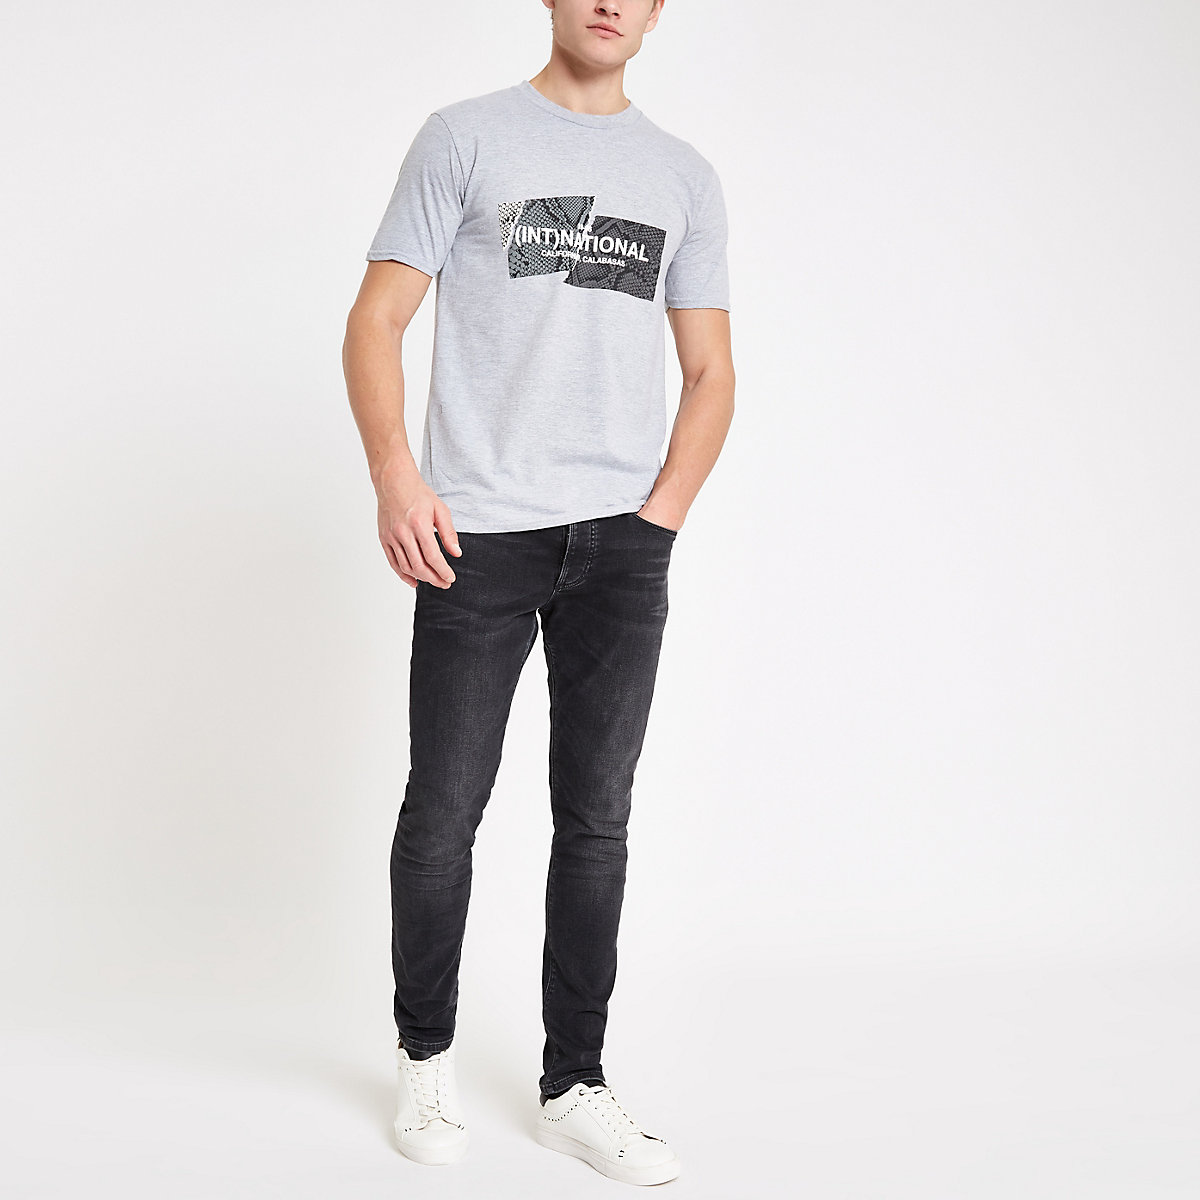 Grey '(Int)national' print slim fit T-shirt